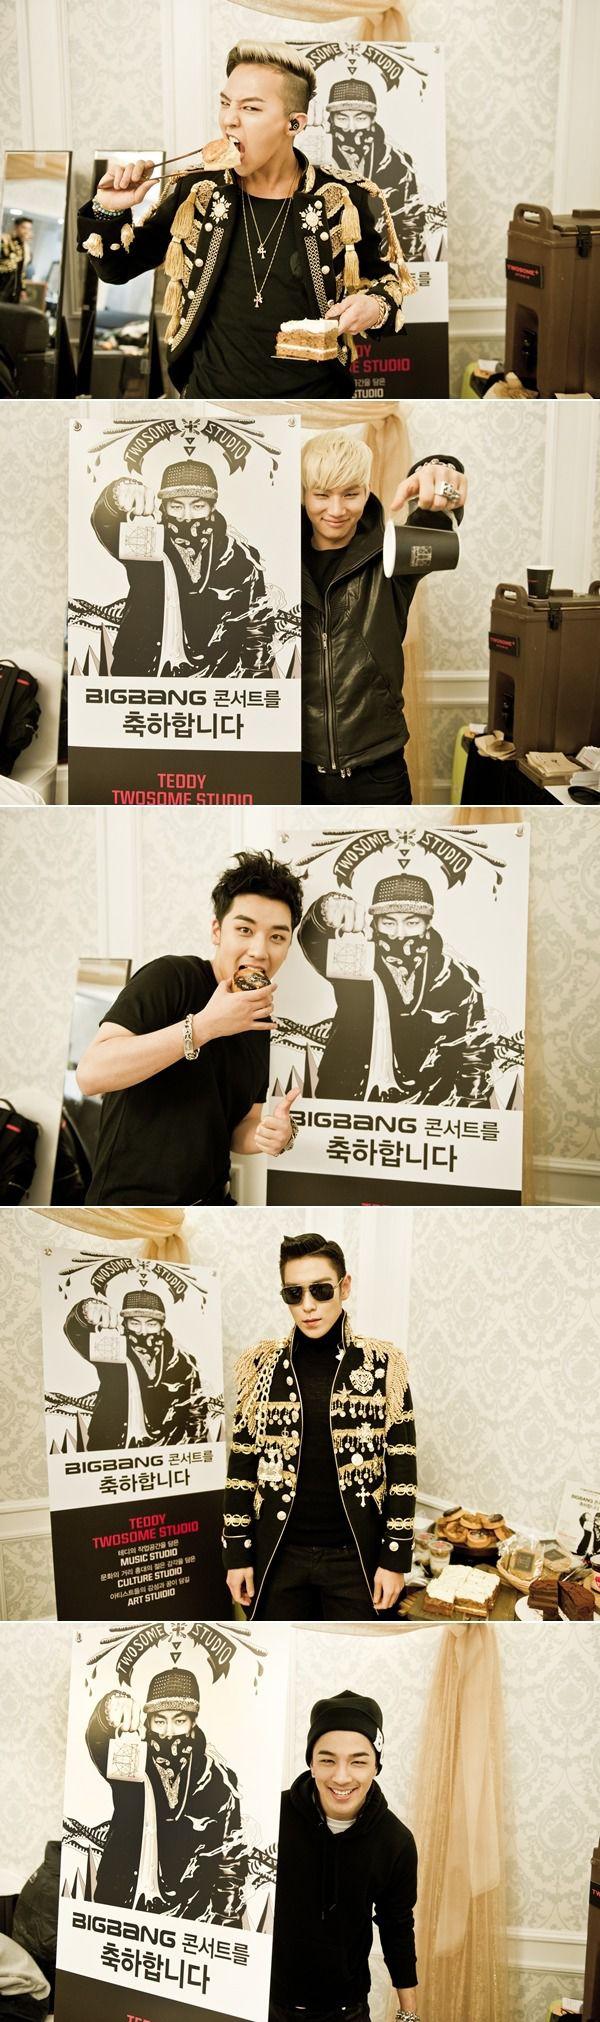 Bigbang is VIP :)